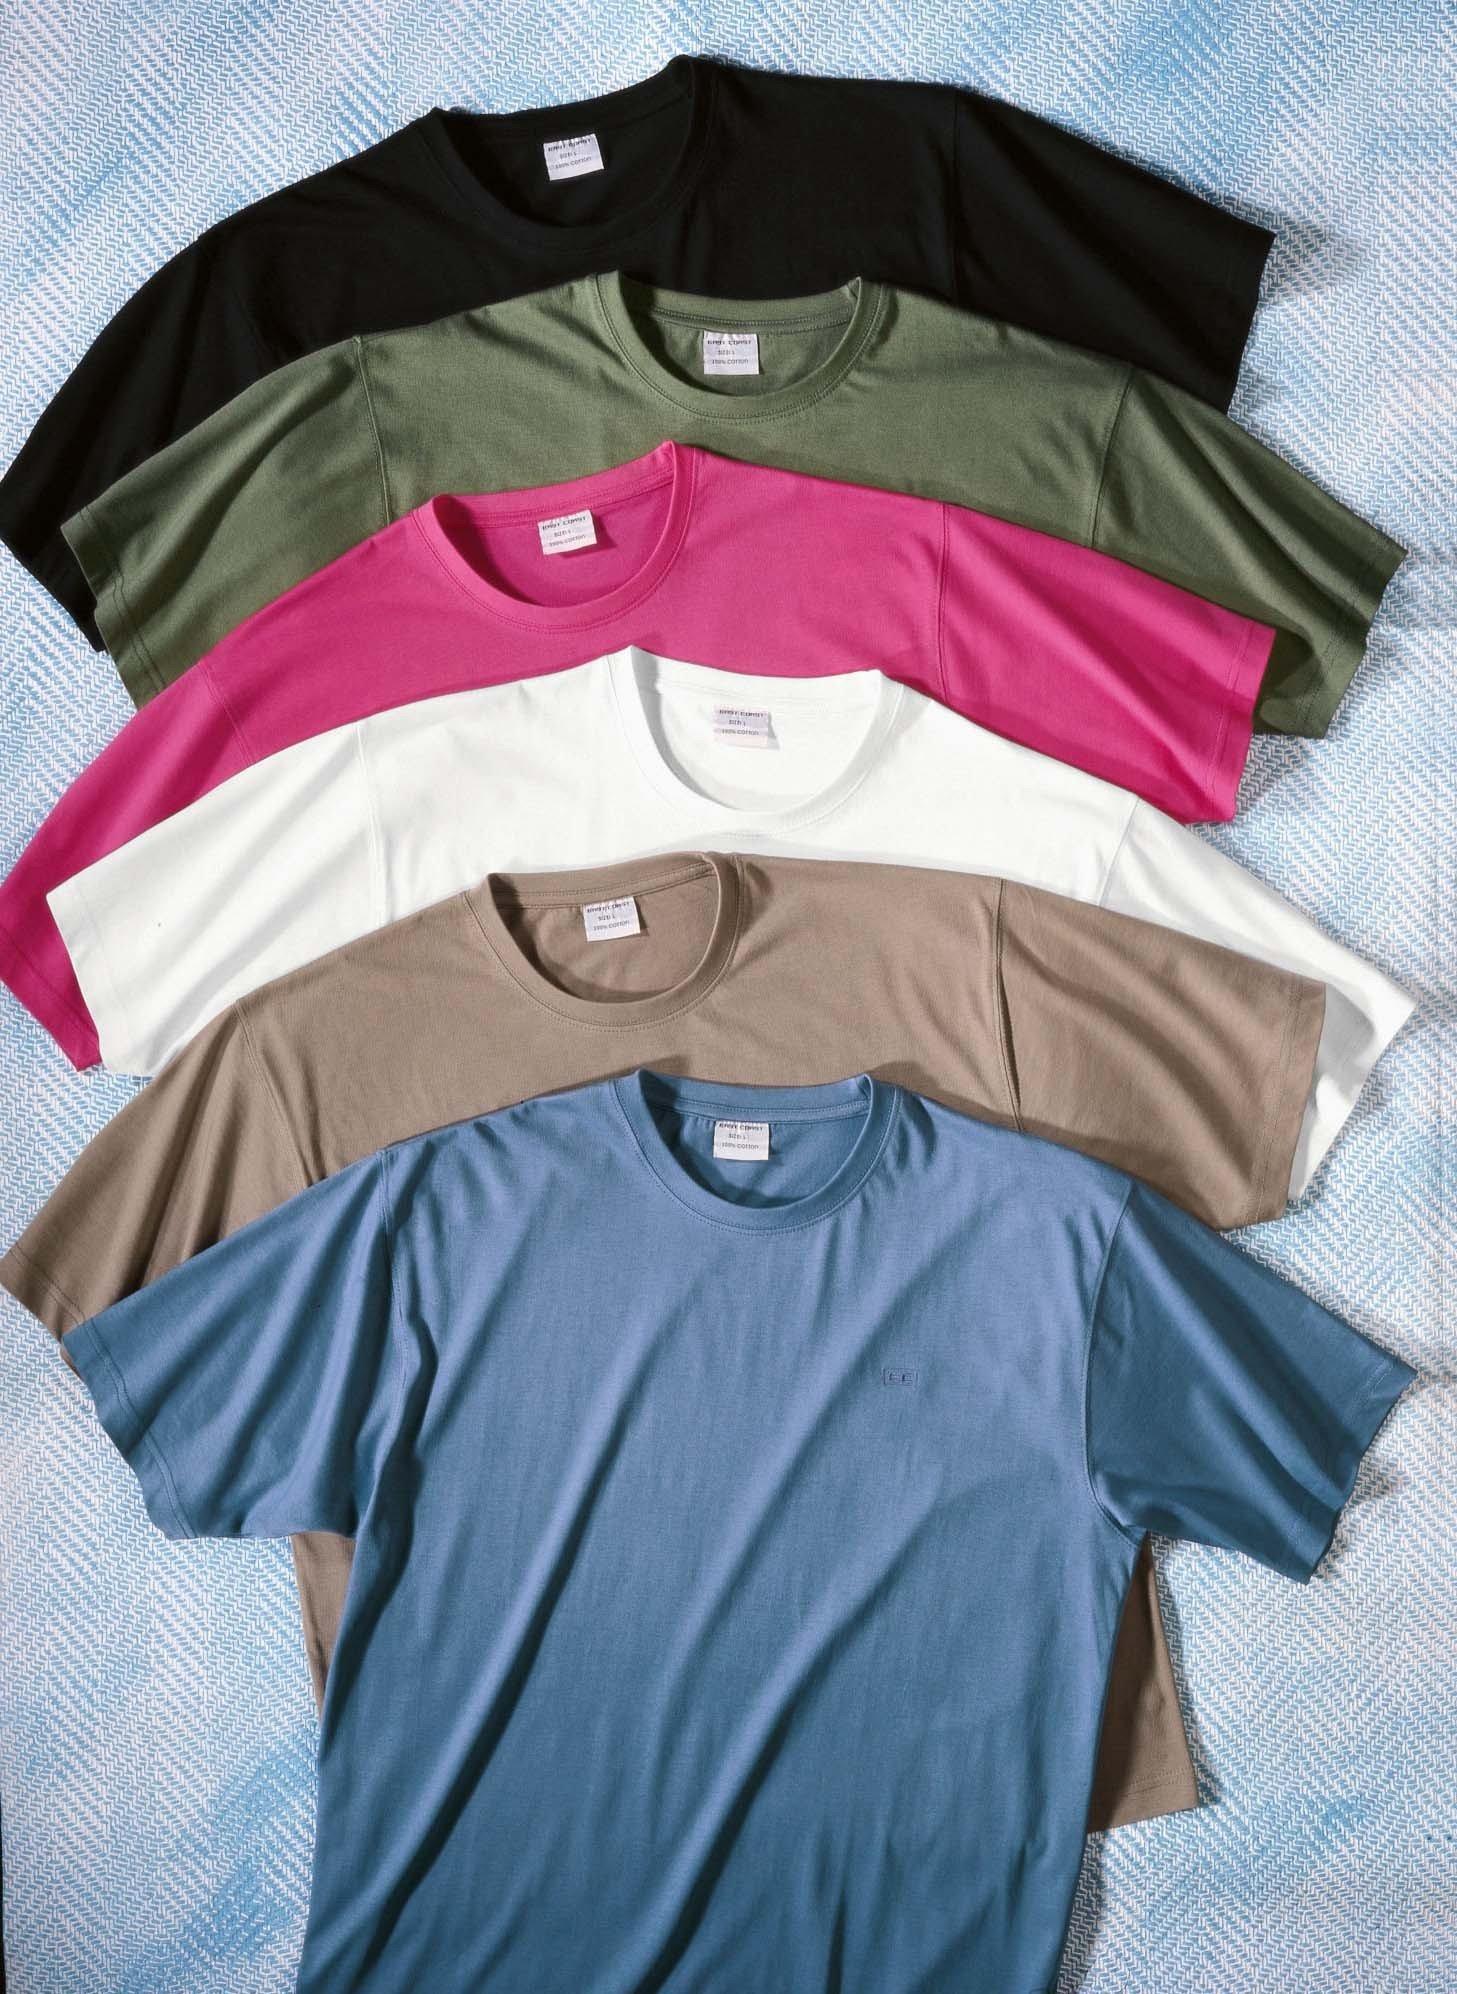 U-KA-Shirt,Stickerei schwarz S 010 - 1 - Ronja.ch